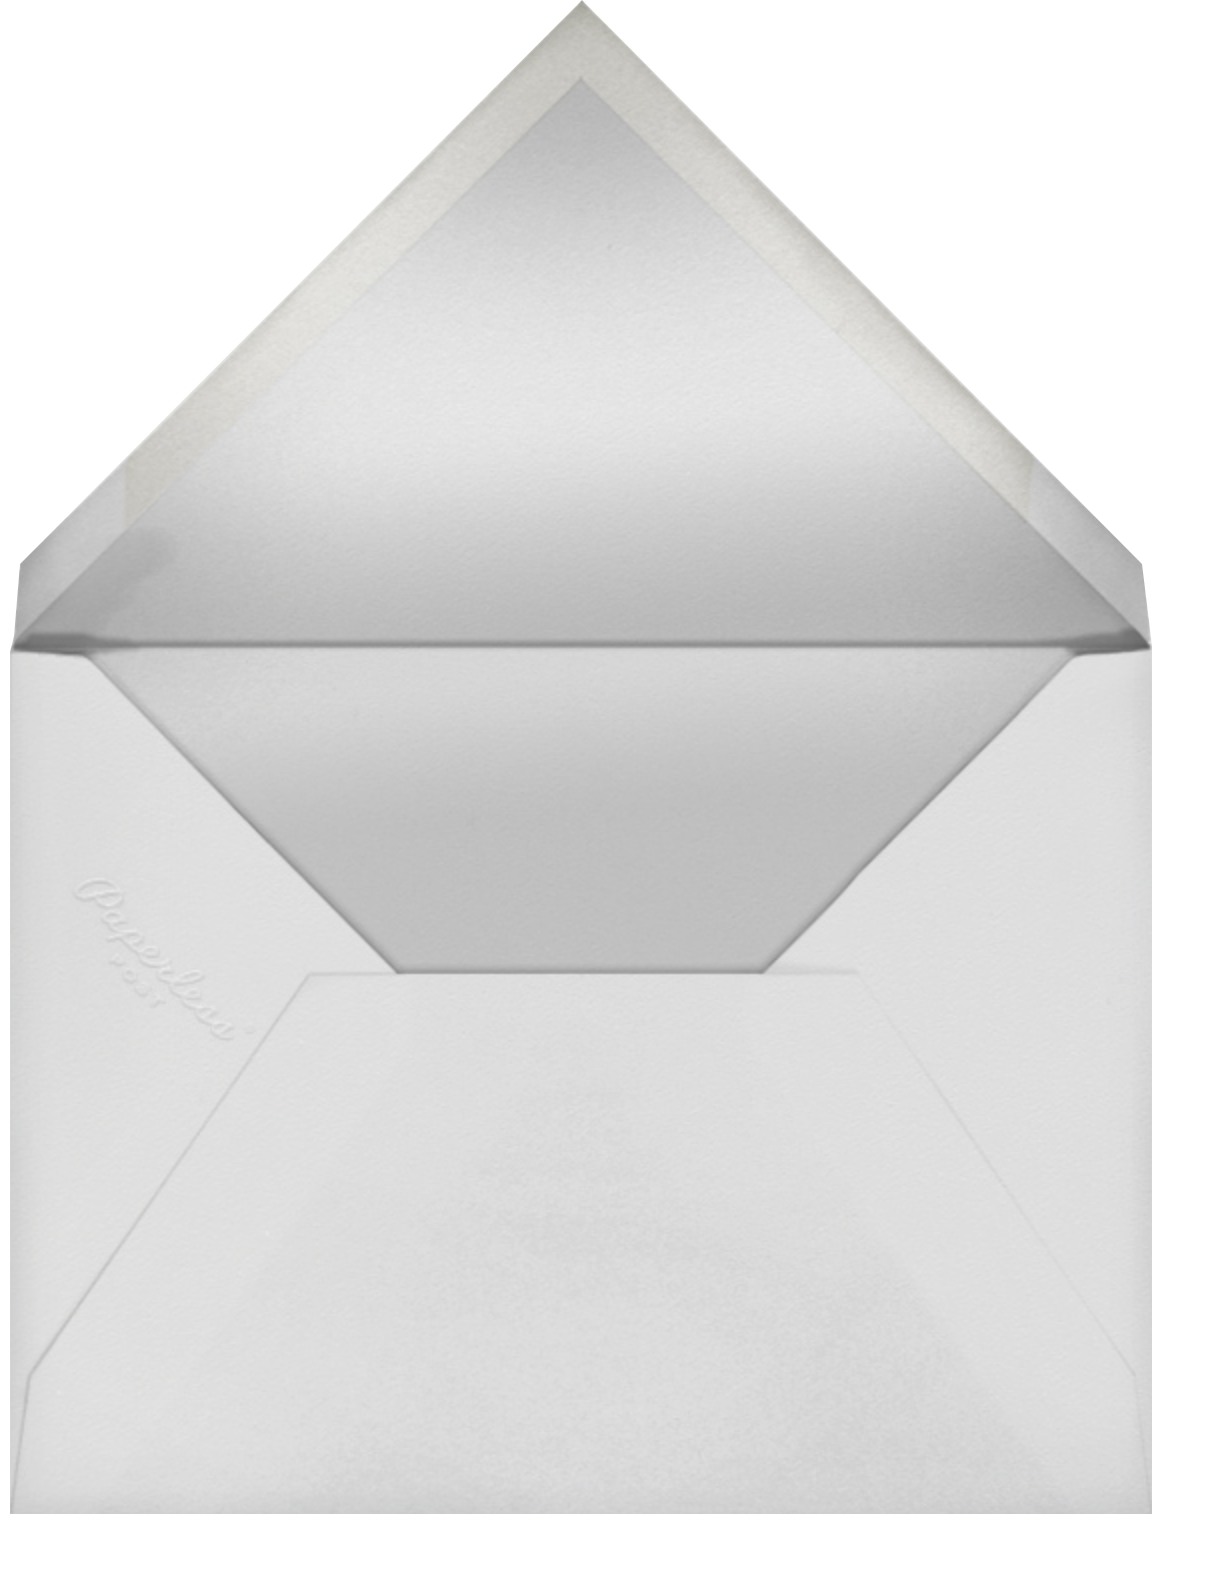 Royal Elephant (Program) - Rifle Paper Co. - Menus and programs - envelope back